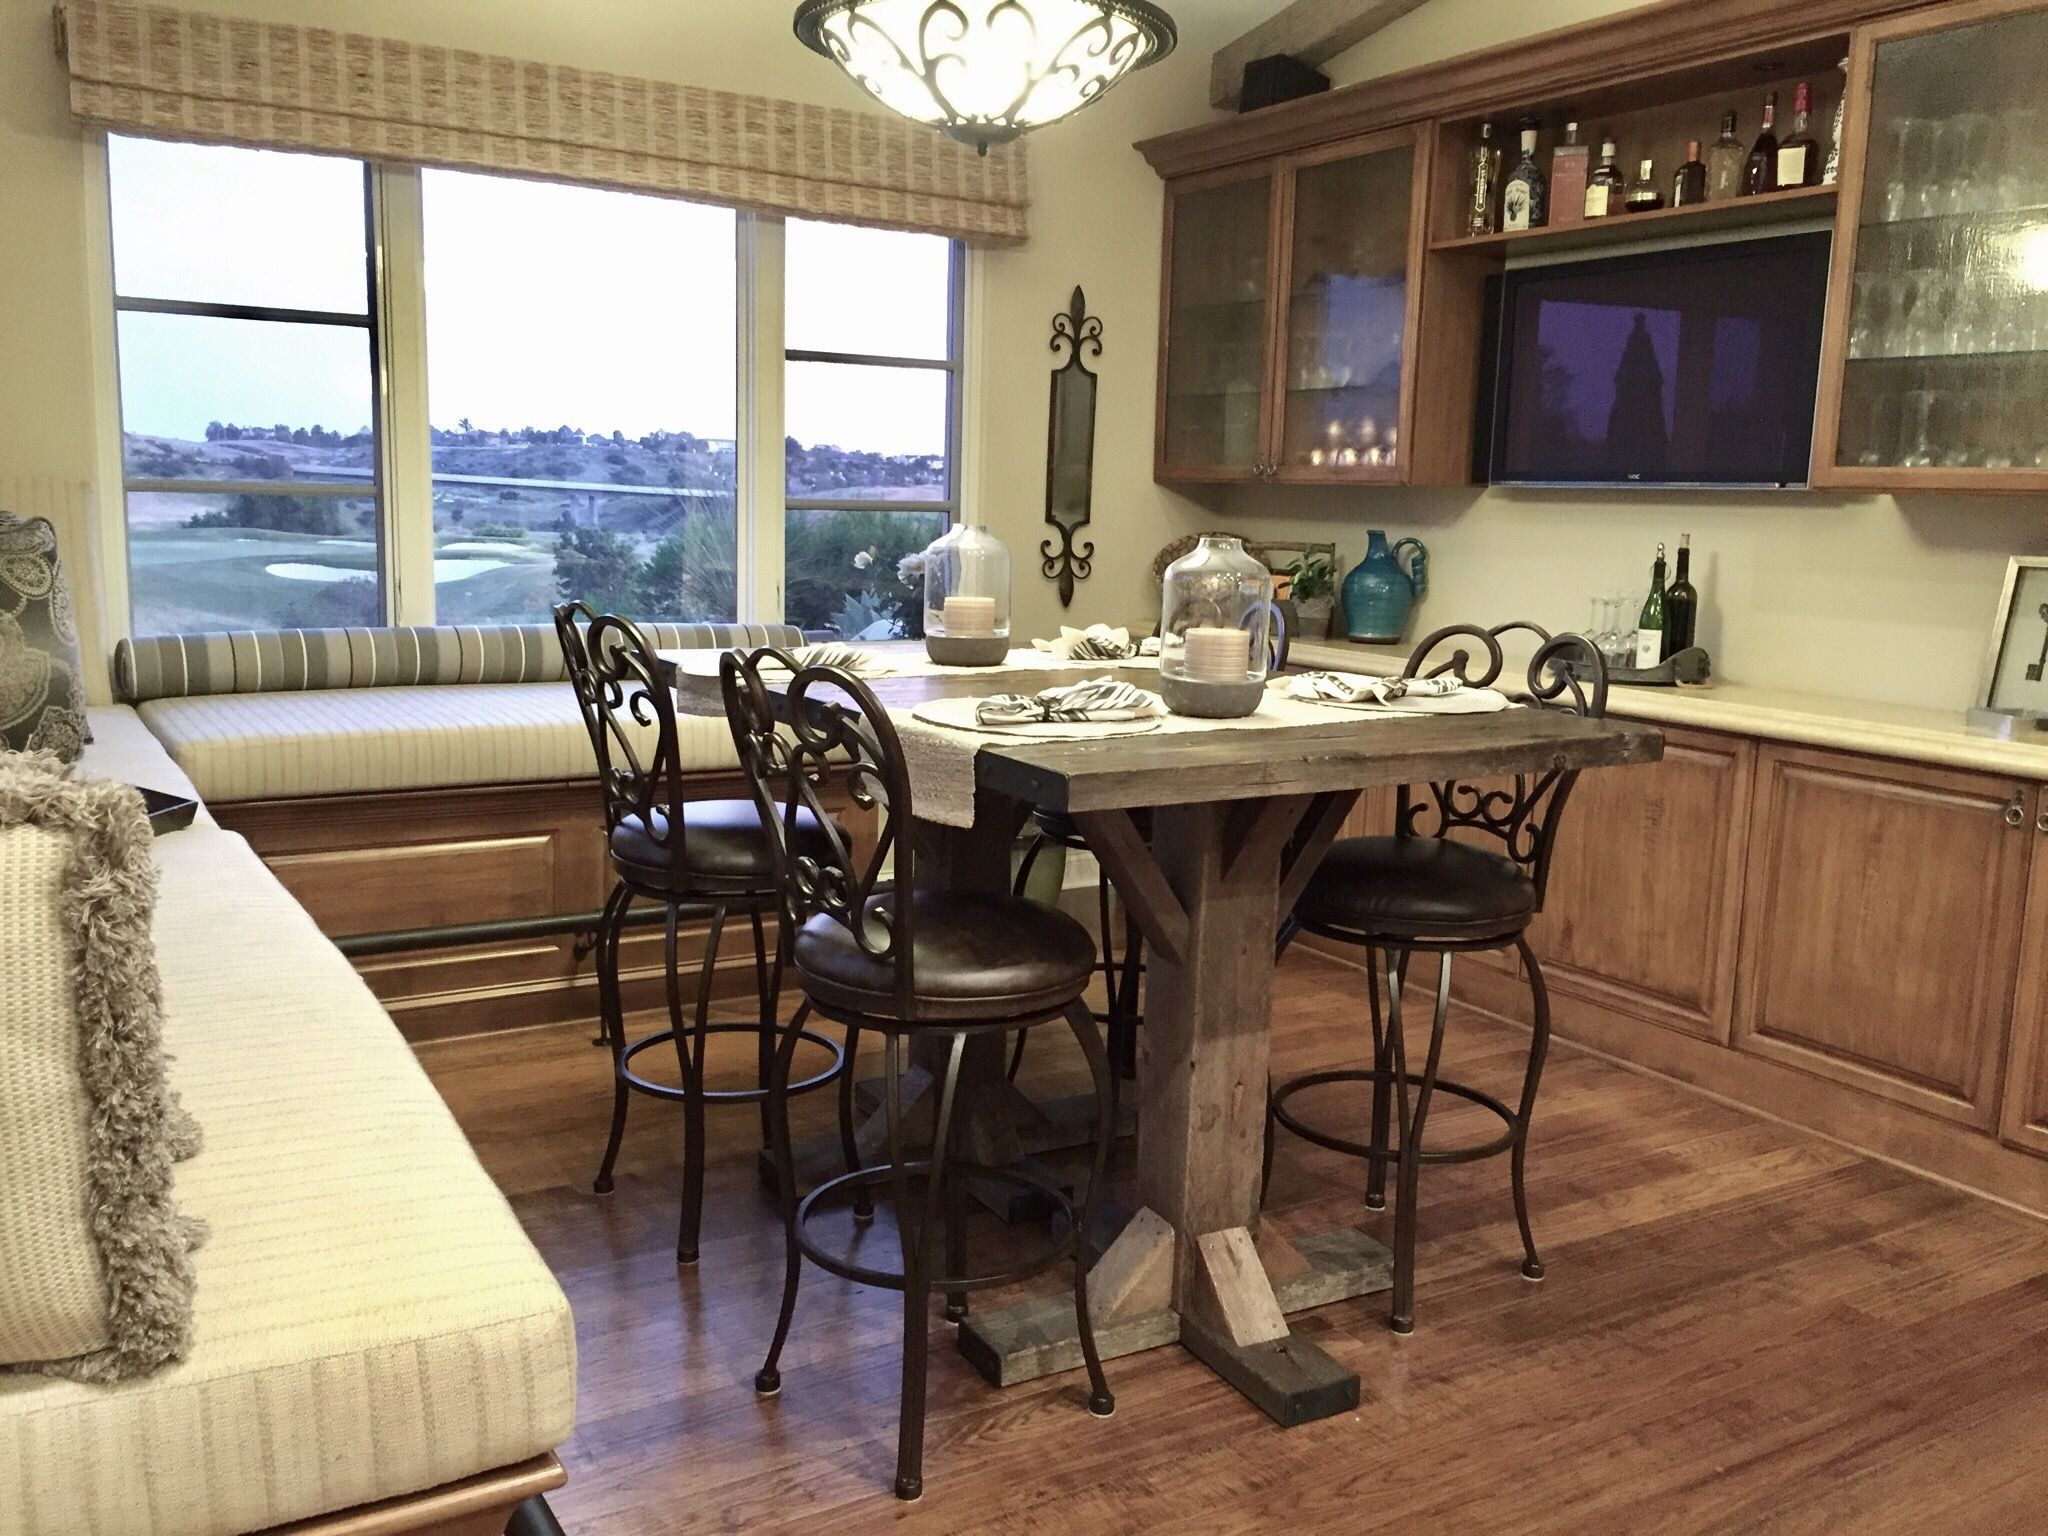 Breakfast Nook, Bar, Reclaimed Wood Tables, Bar Stools, Design Ideas, Home